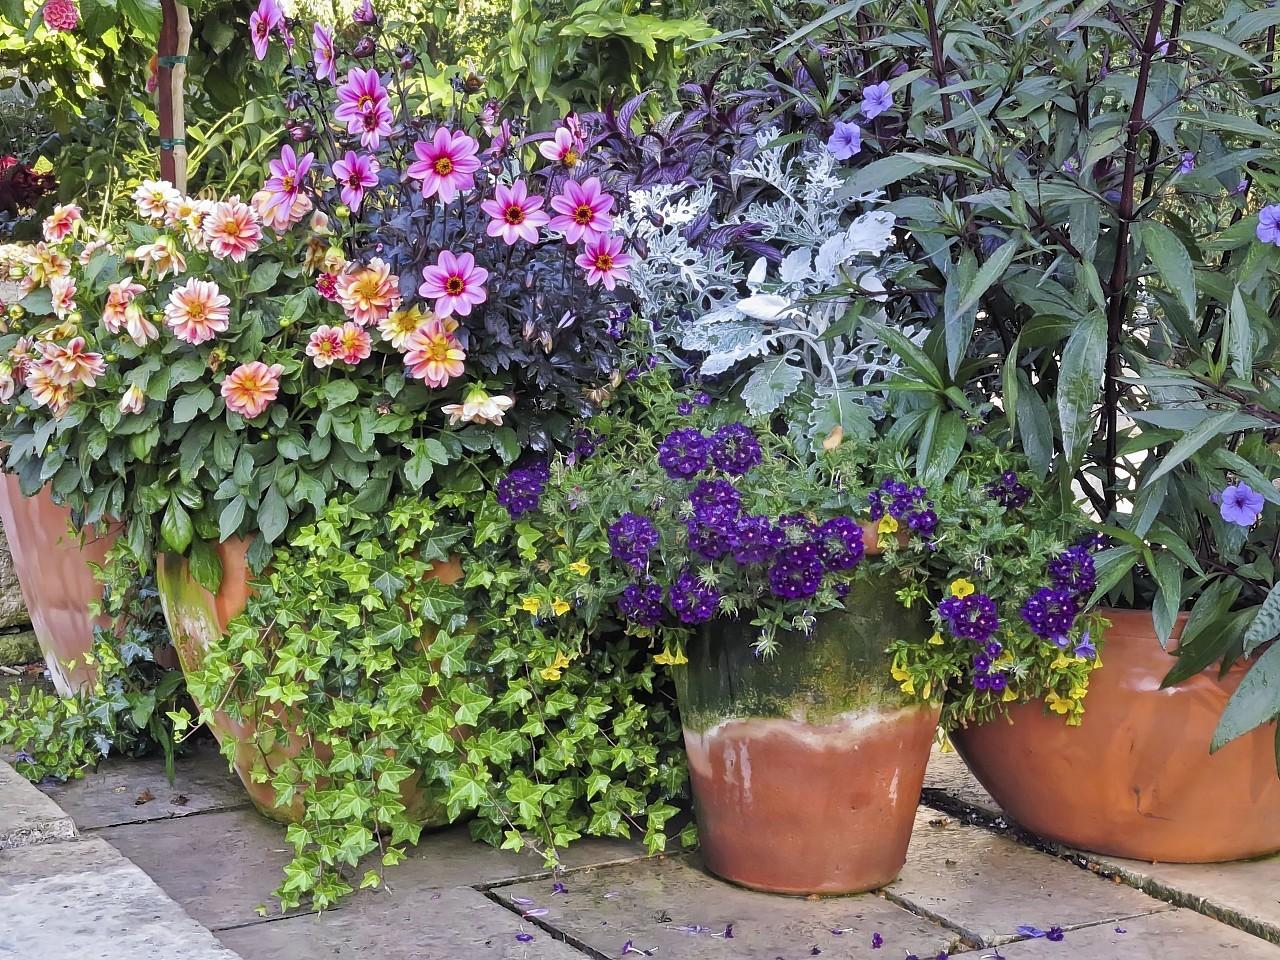 Pot-plants-in-a-garden